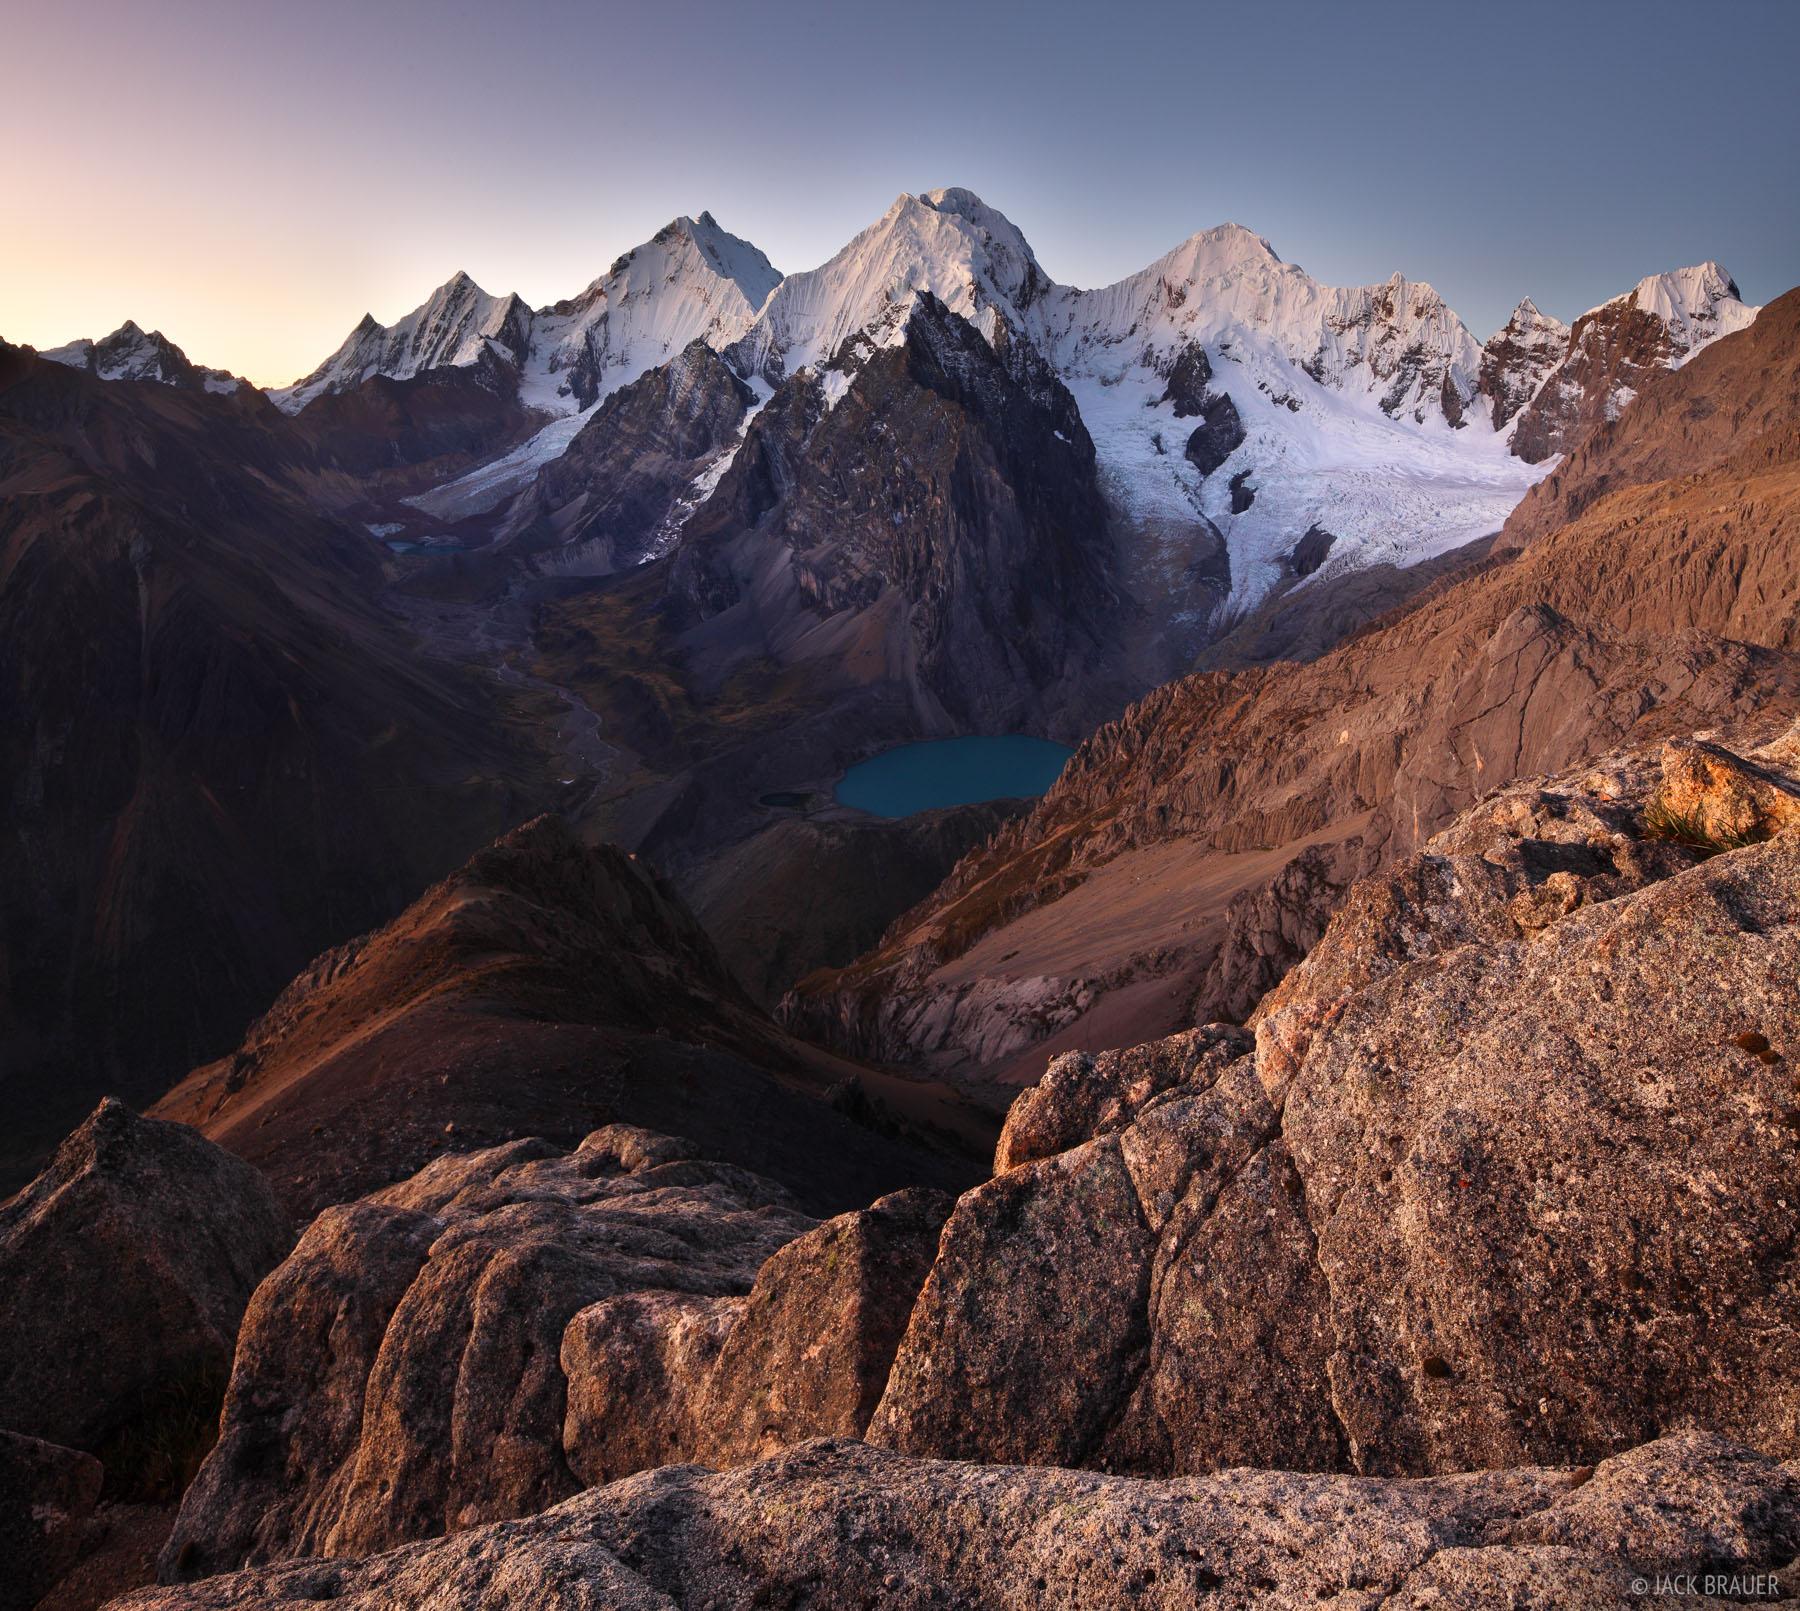 Suila, Cordillera Huayhuash, Peru, Cerro San Antonio, Rasac, Yerupaja, Sarapo, Carnicero, Laguna Jurau, photo